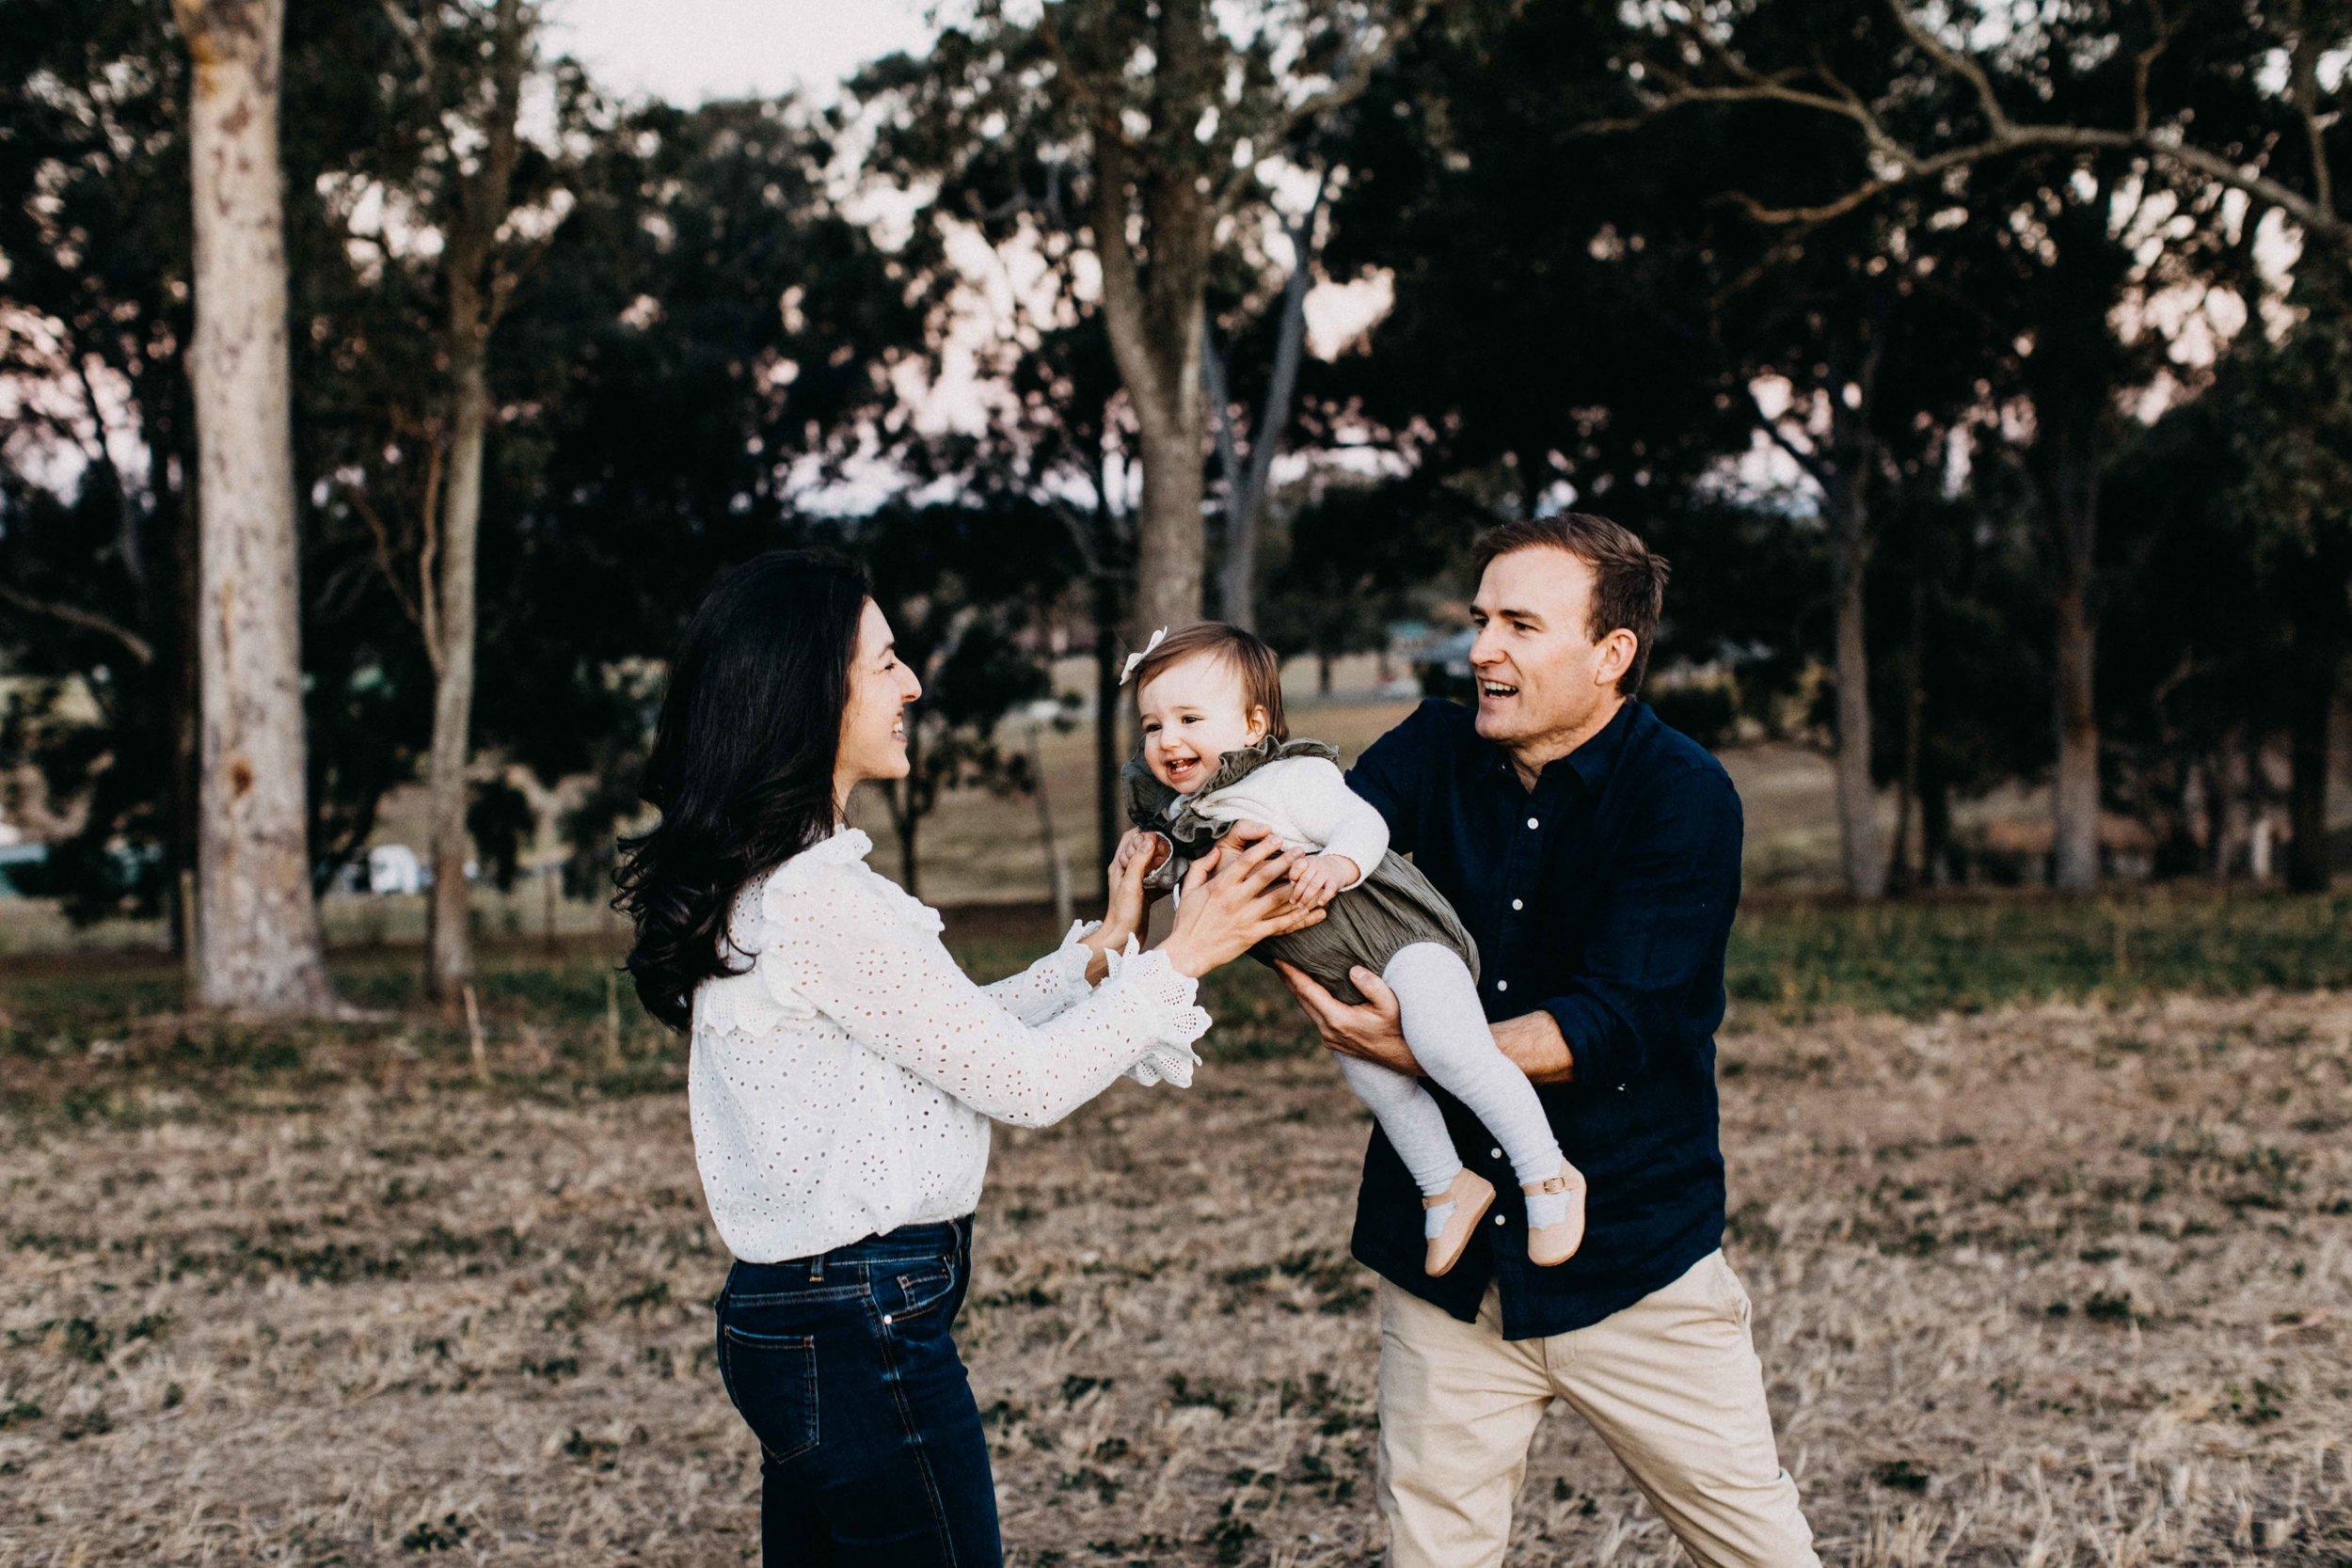 camden-family-photography-galea-www.emilyobrienphotography.net-43.jpg